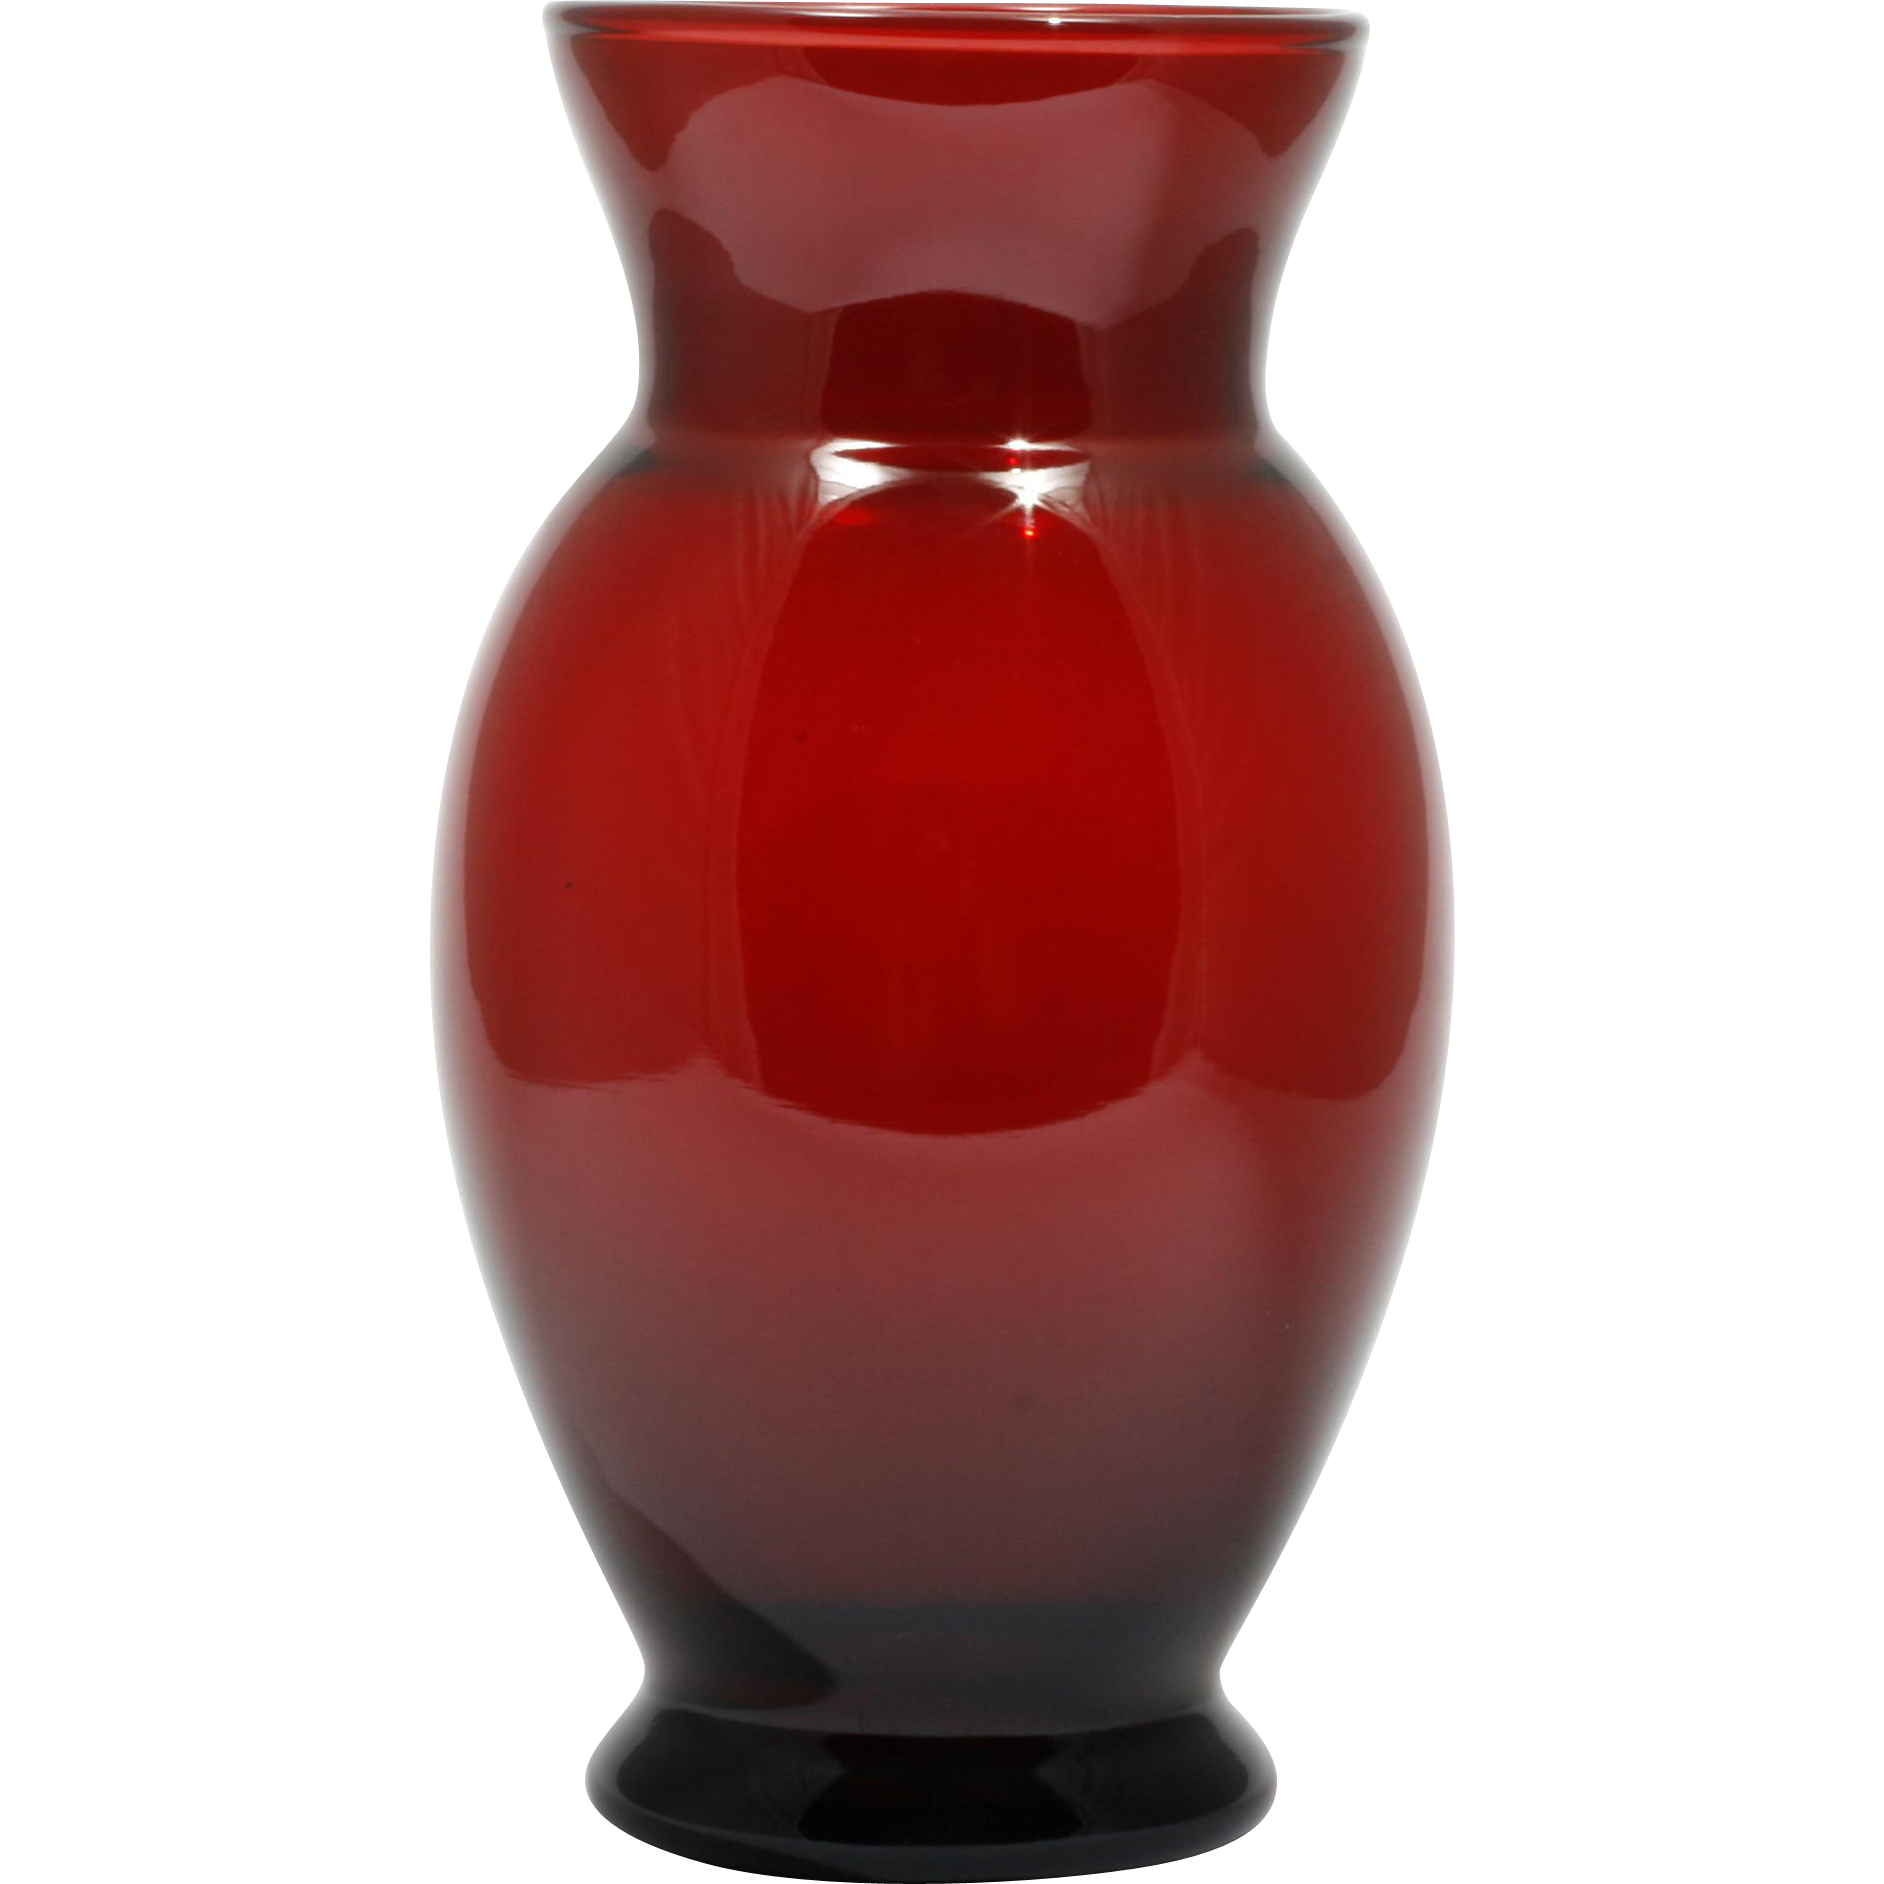 Anchor hocking royal ruby vase red vintage art glass 1960s mid anchor hocking royal ruby vase red vintage art glass 1960s mid century catisfactions glass gallery ruby lane reviewsmspy